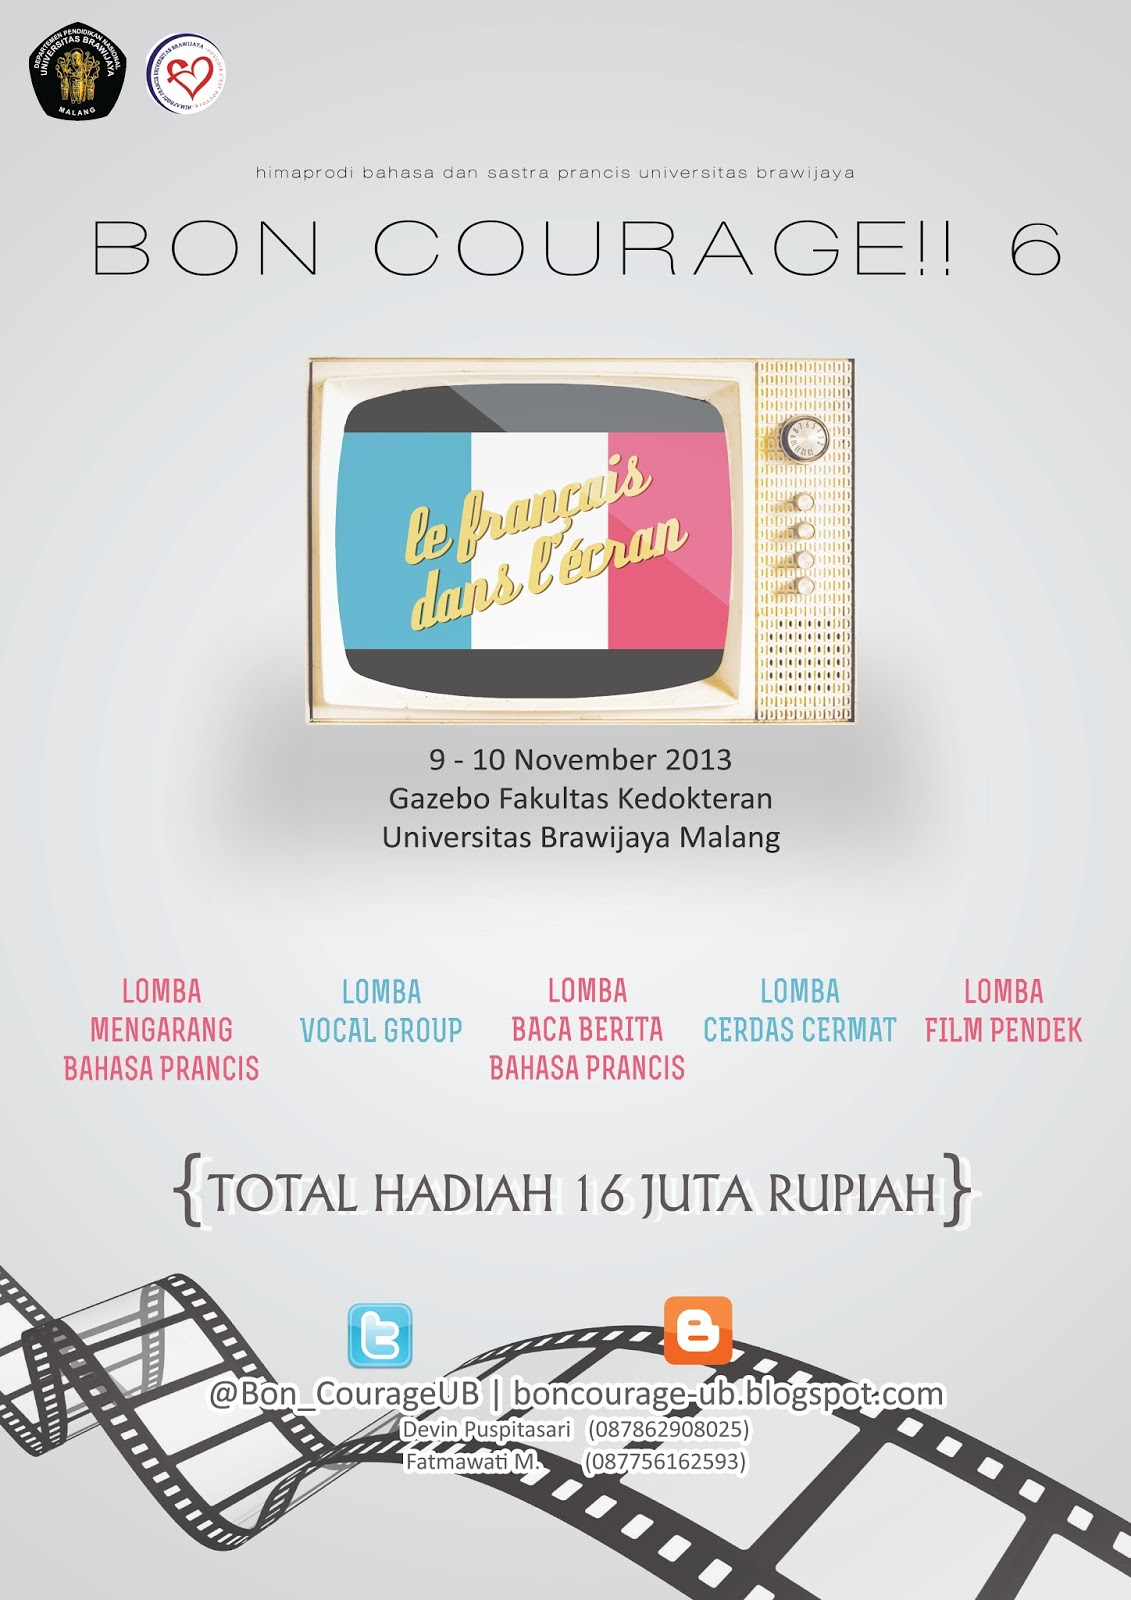 bon courage universitas brawijaya lomba film pendek bon courage 6. Black Bedroom Furniture Sets. Home Design Ideas